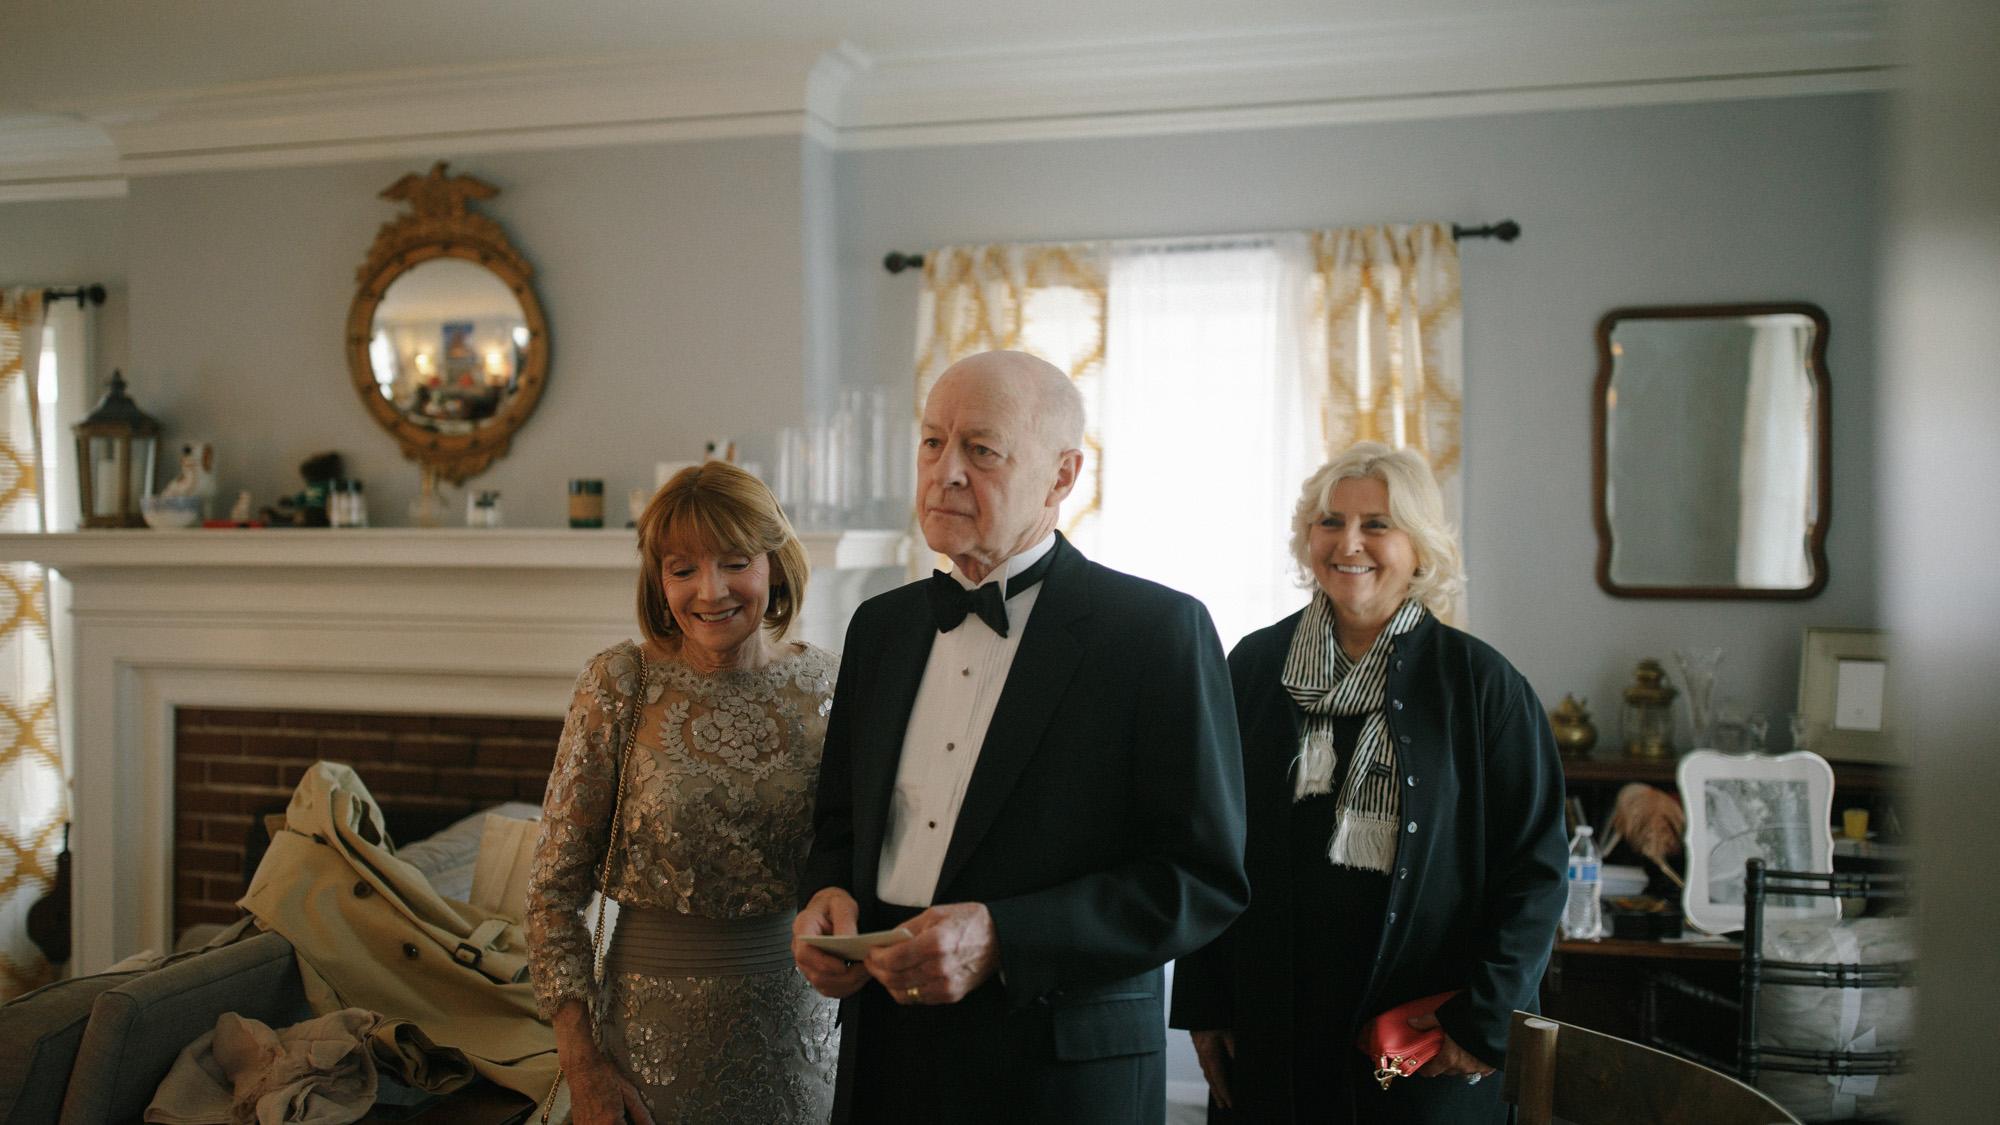 Alec_Vanderboom_kansas_city_hip_wedding_photos-0022.jpg